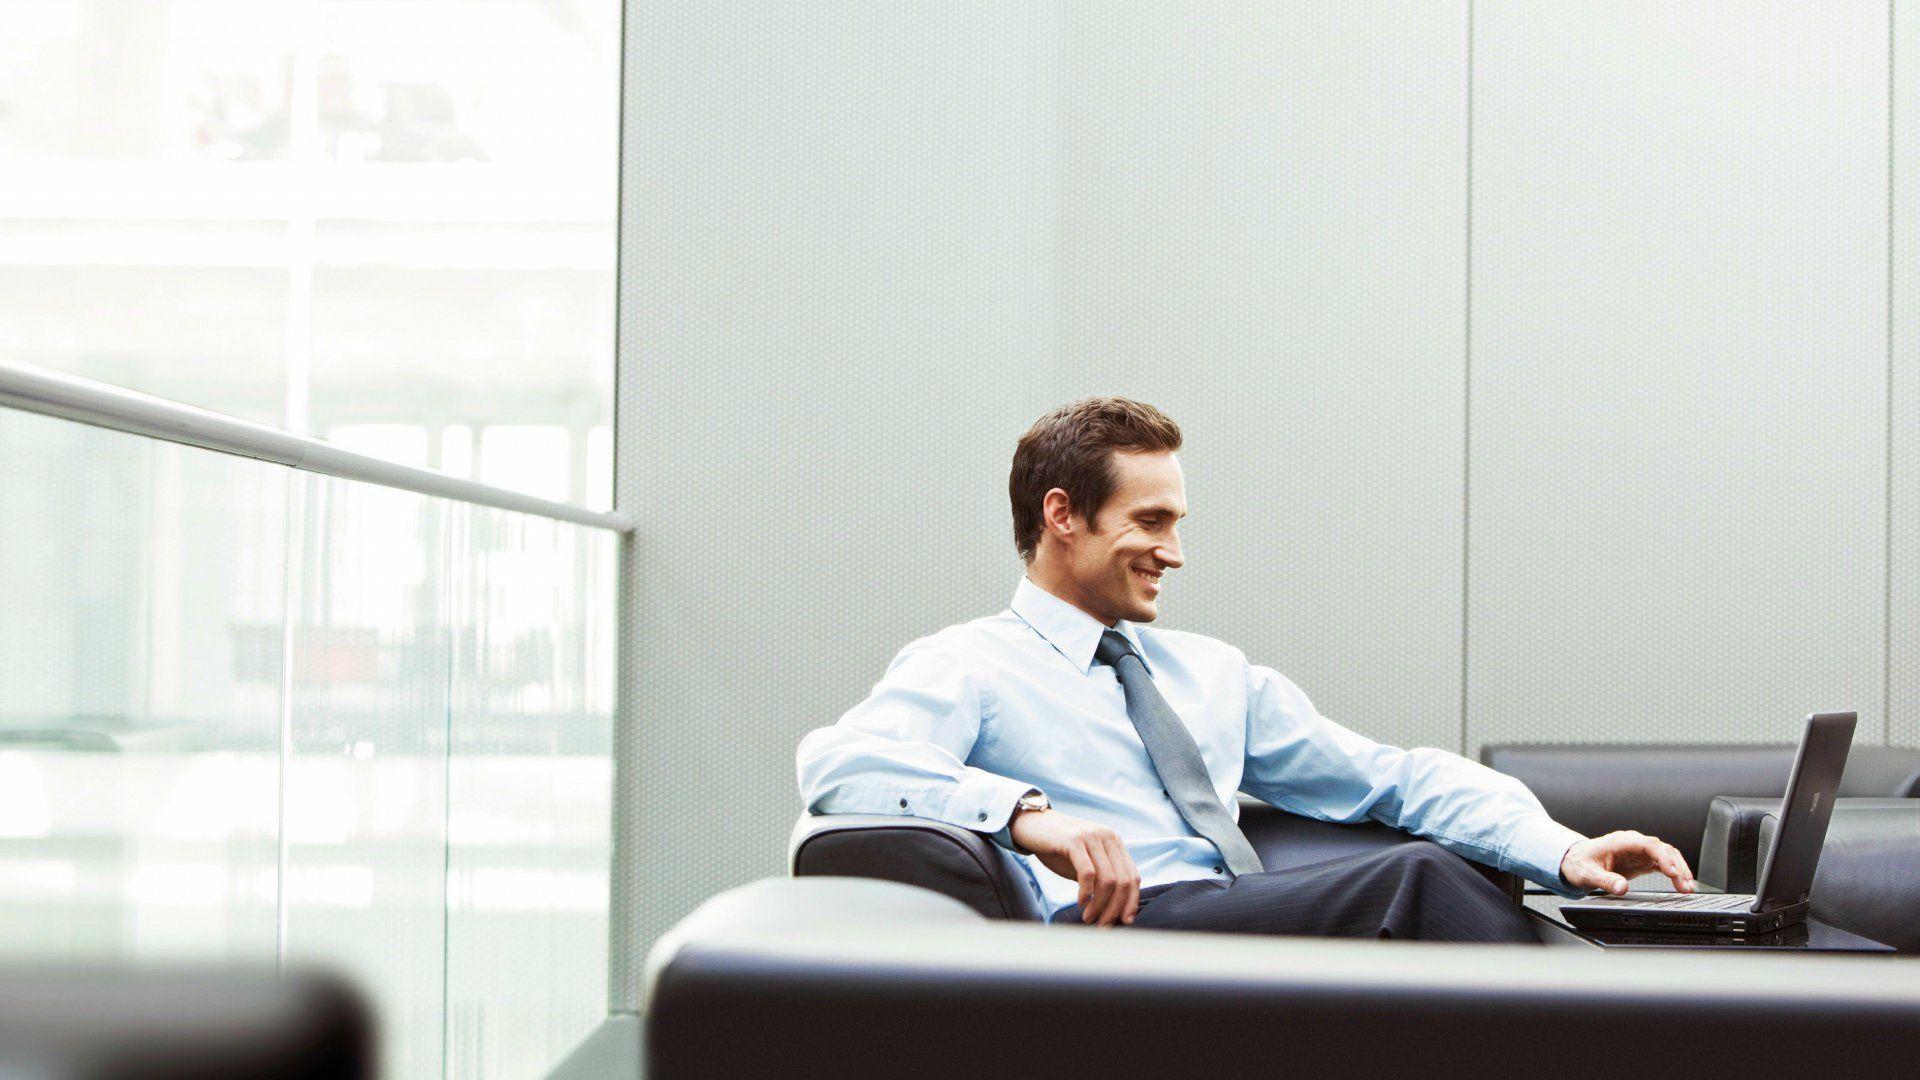 man_office_businessman_smile_laptop_79850_1920x1080-business-man